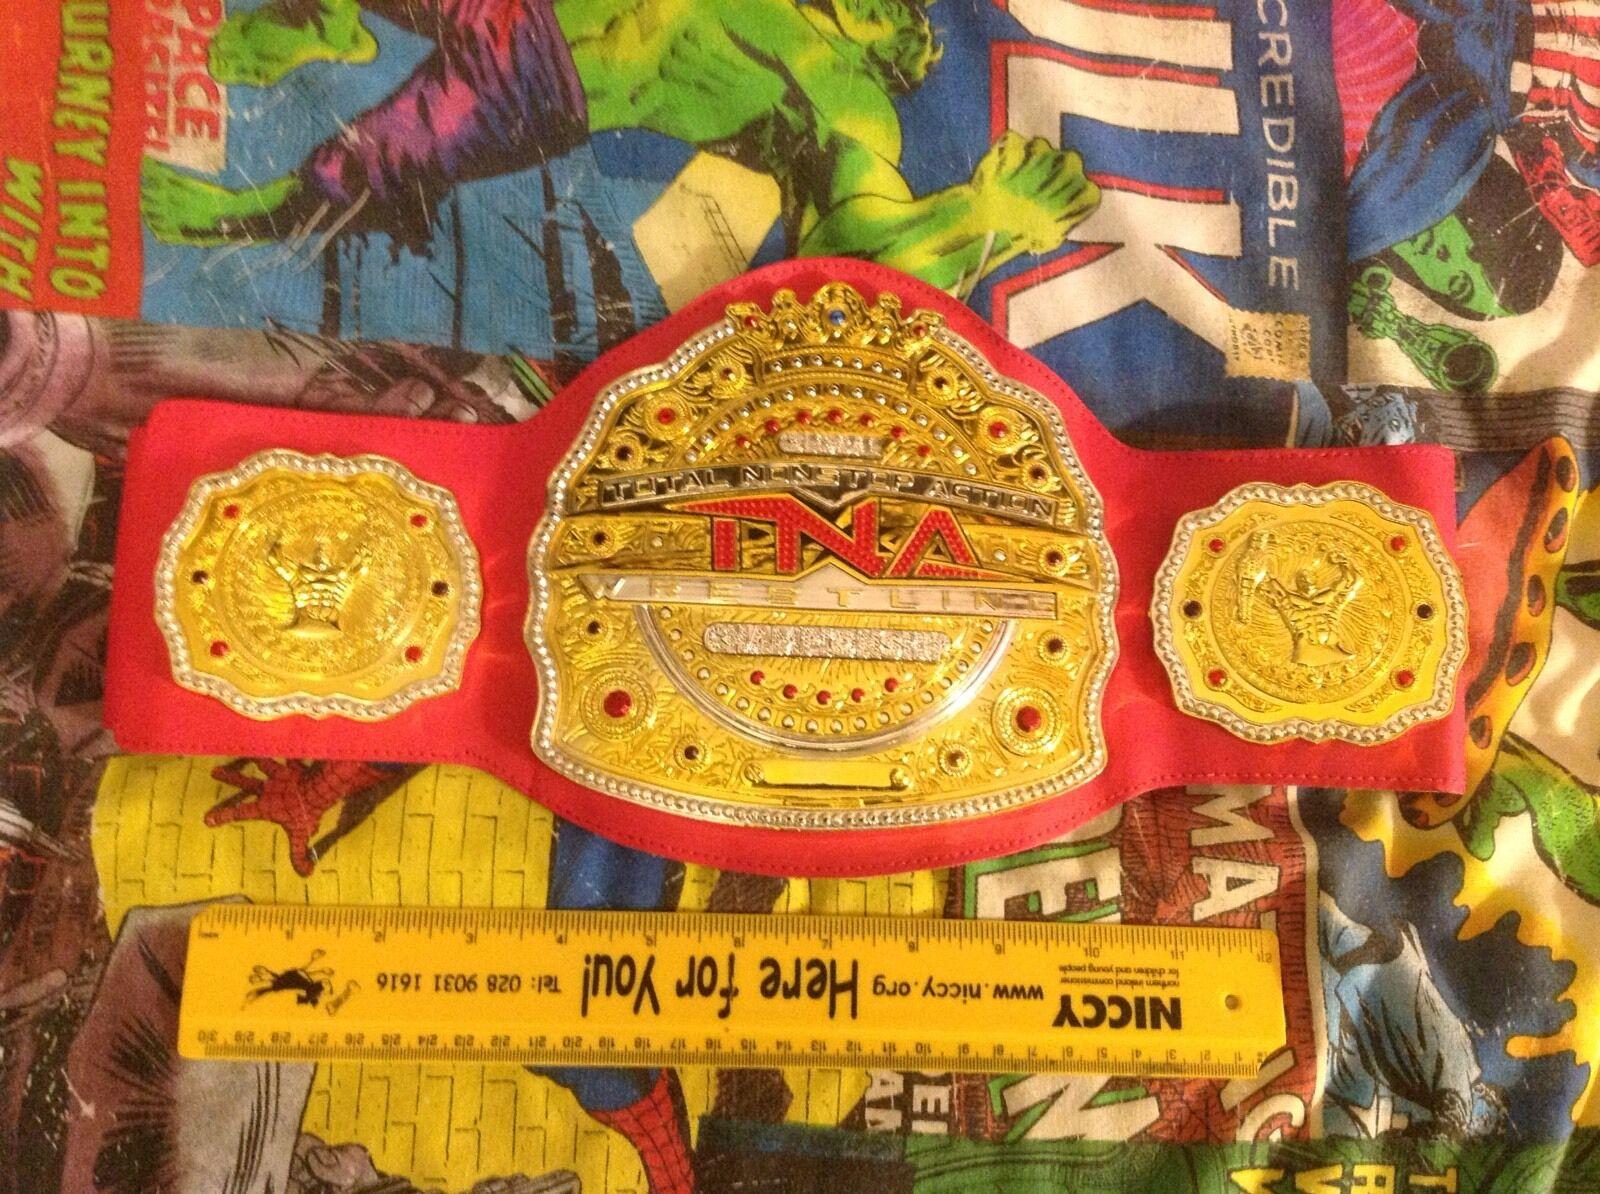 TNA Global Championship Replica Belt 2010 Jakks Pacific - rot - Very Rare